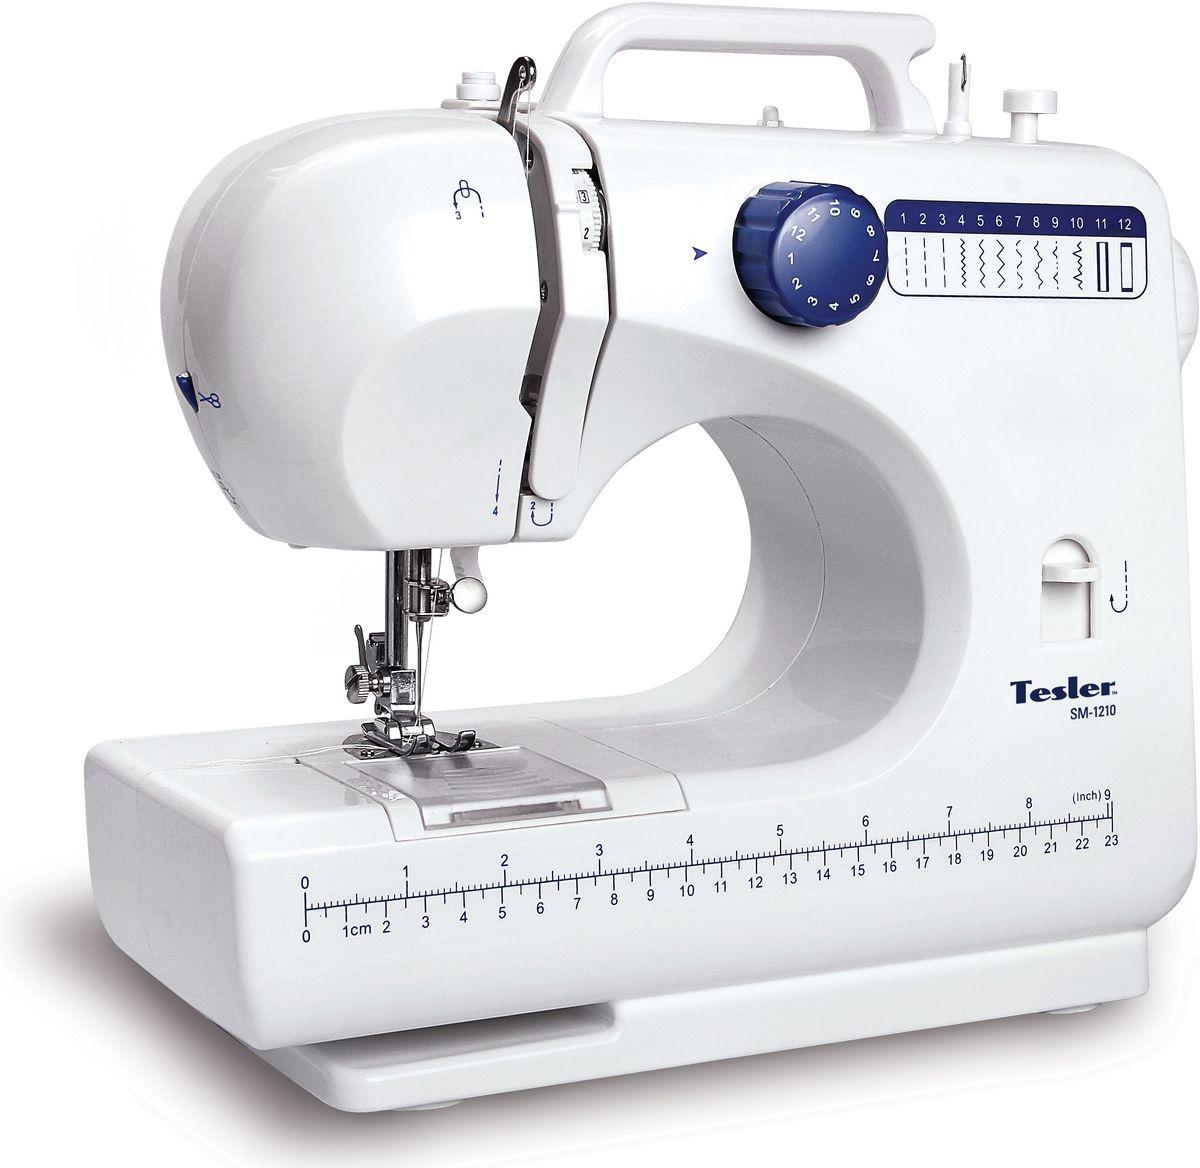 Tesler SM-1210, White швейная машинка